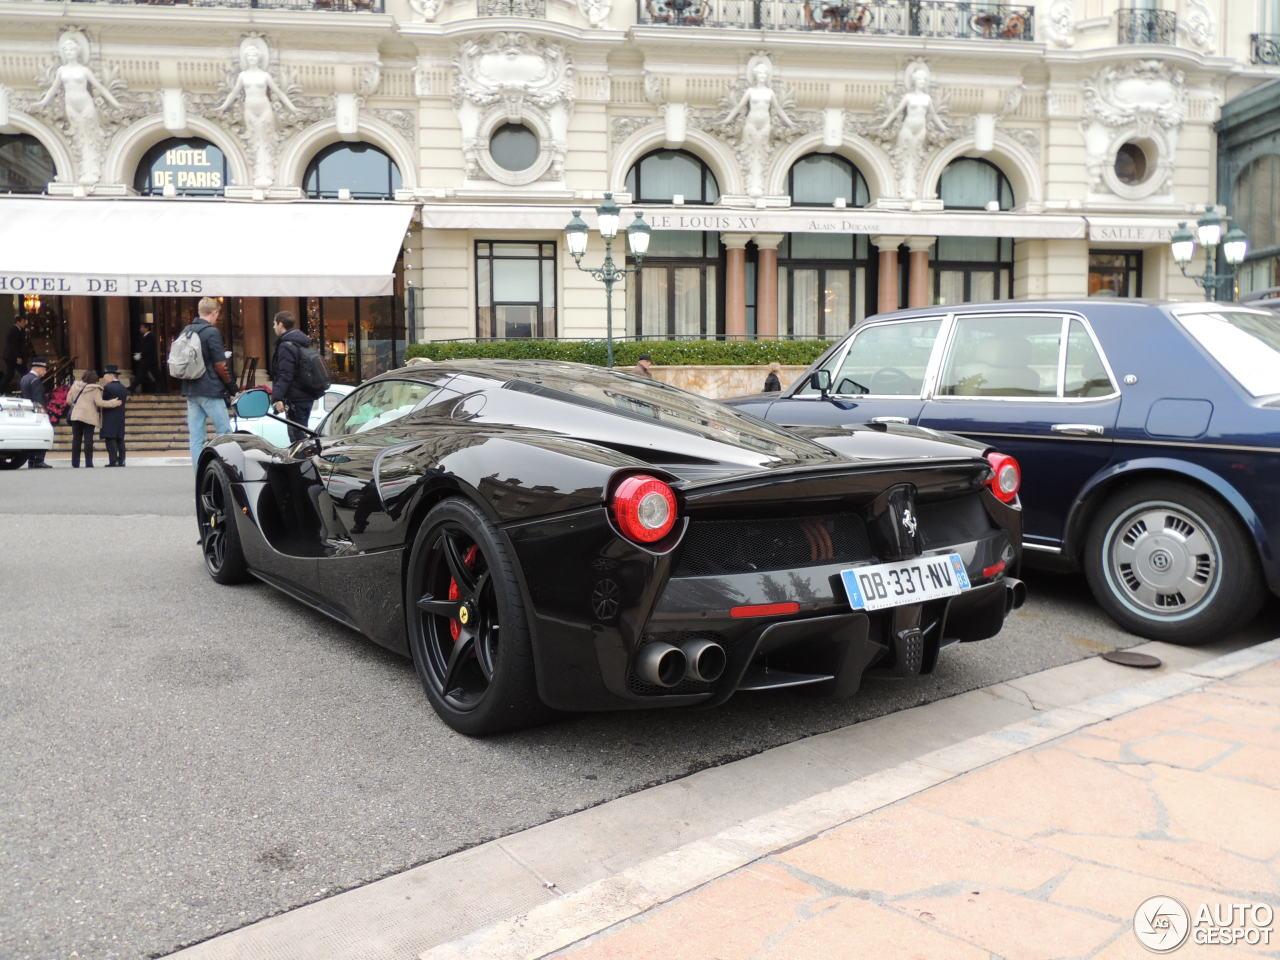 Ferrari Laferrari 23 December 2013 Autogespot